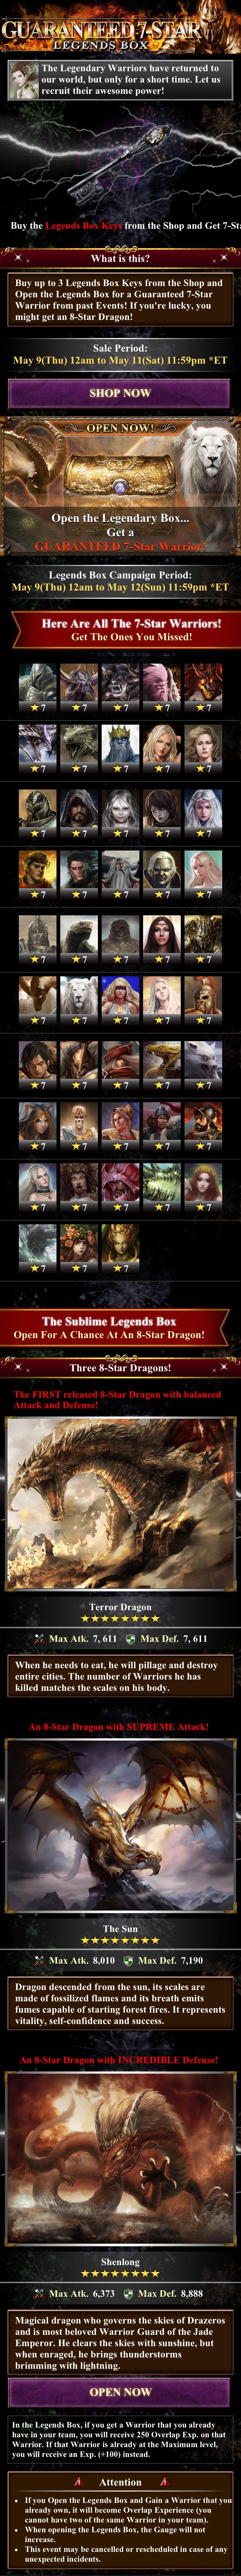 Guaranteed 7 Star (Legends Box)